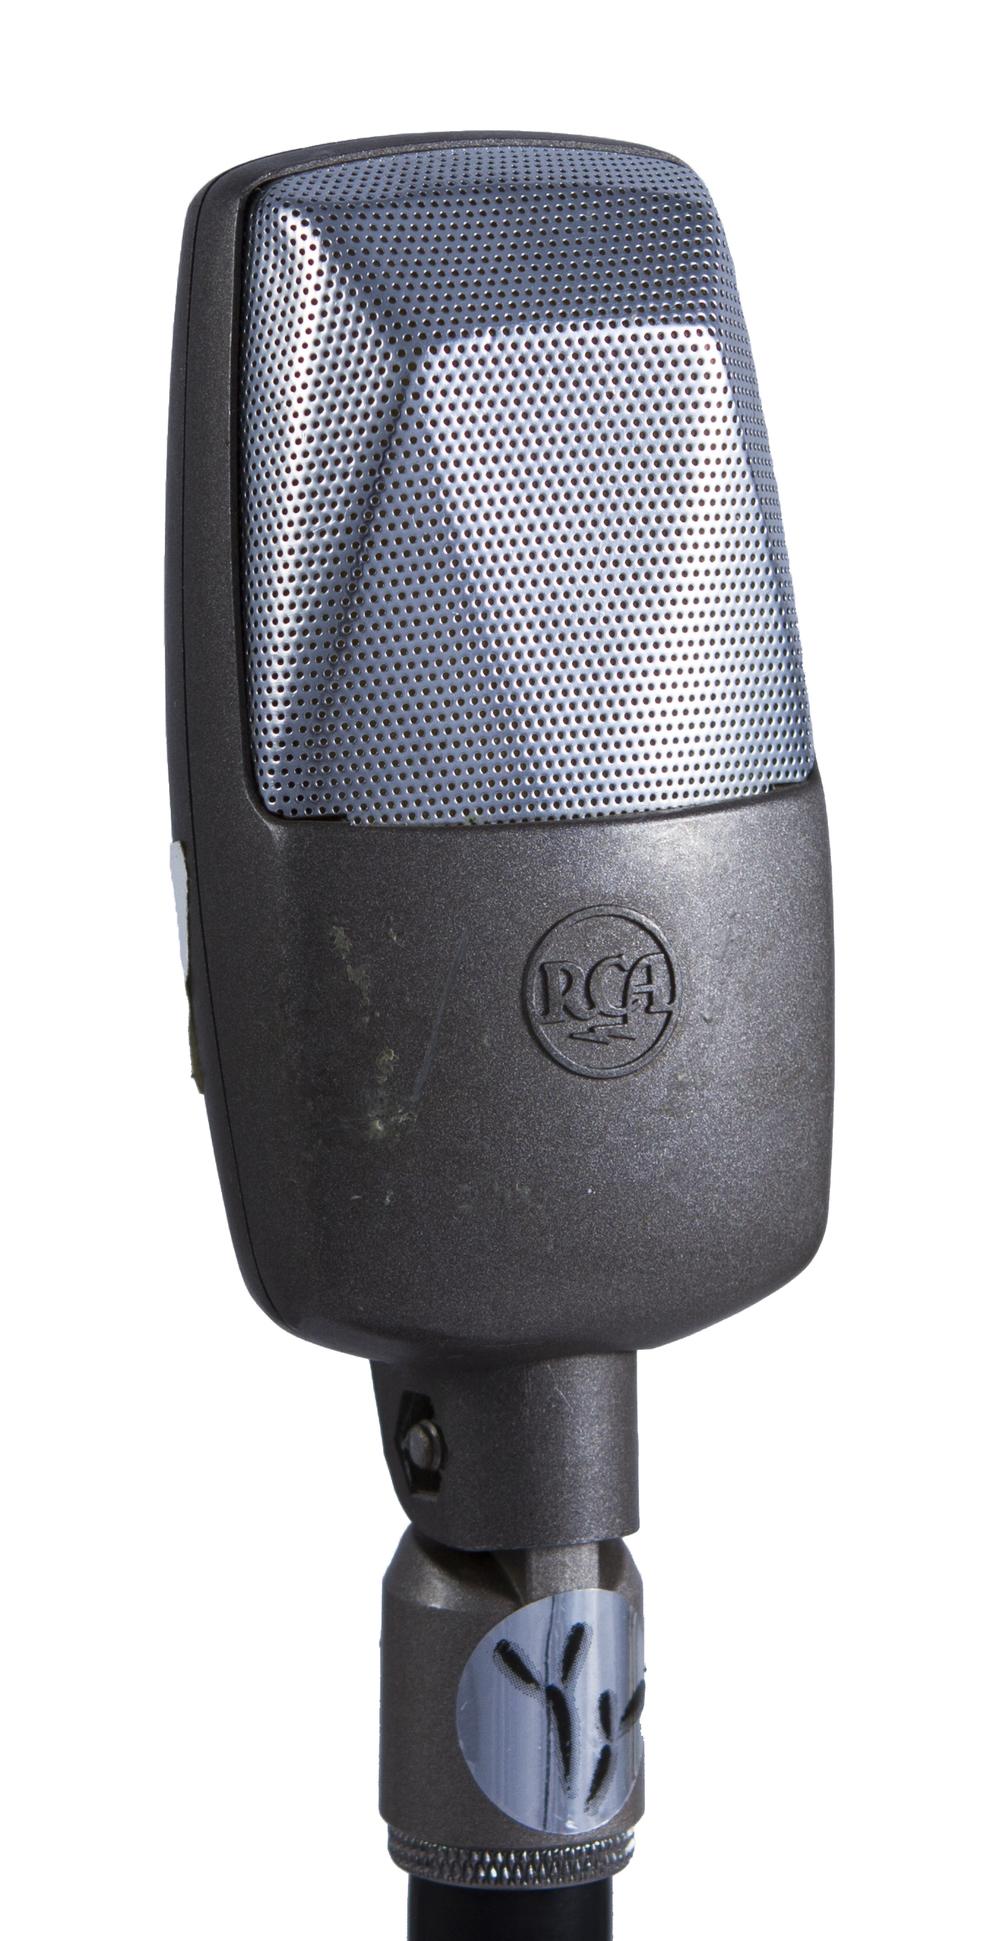 RCA SK35.jpg